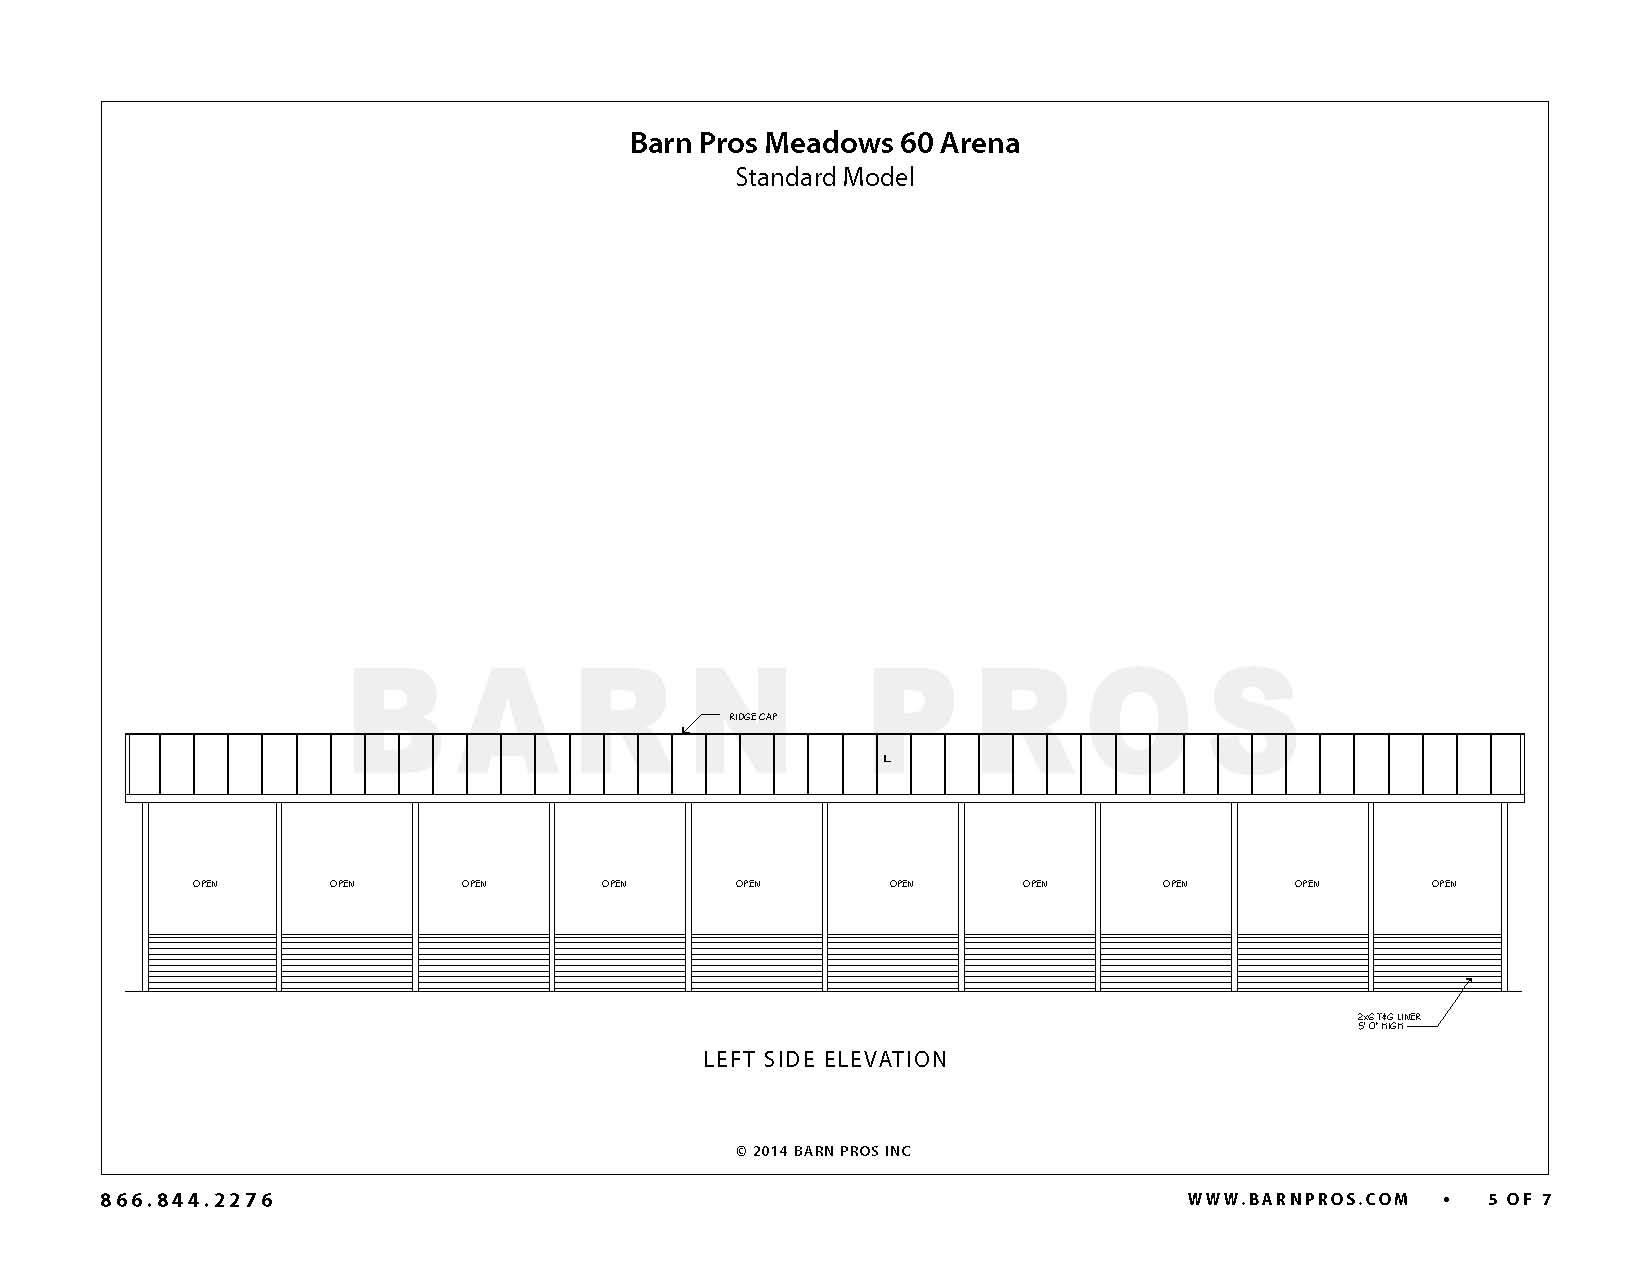 Meadows Barn Pros